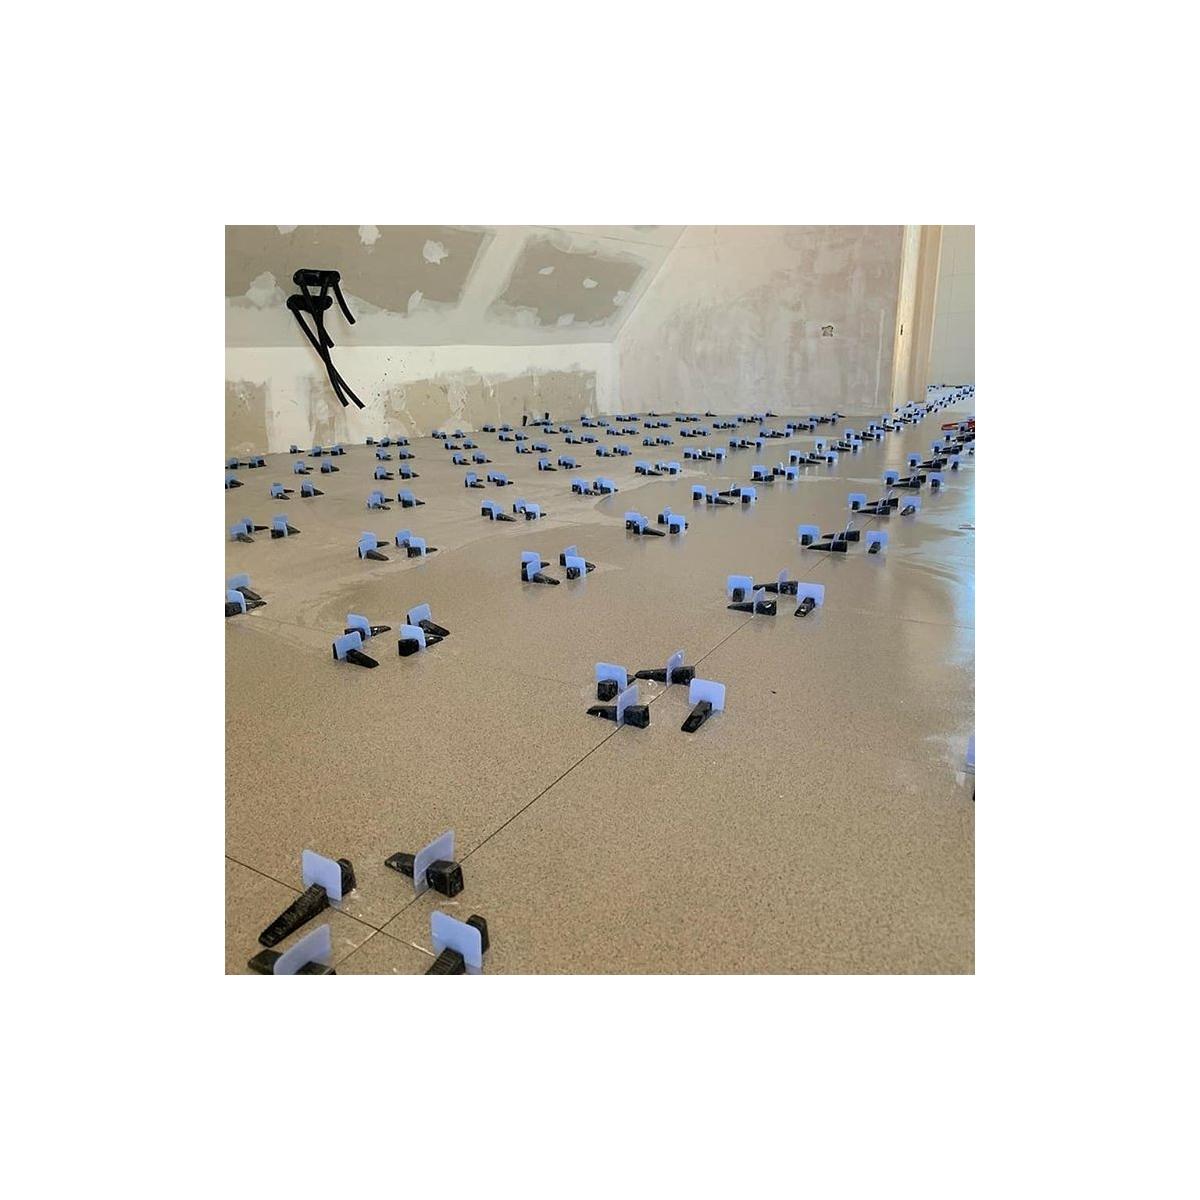 Calzos o Bases de 0,5mm para el sistema de Peygran en bolsa de 300 unidades. Fácil colocacion. Evita escalones en tus baldosas.